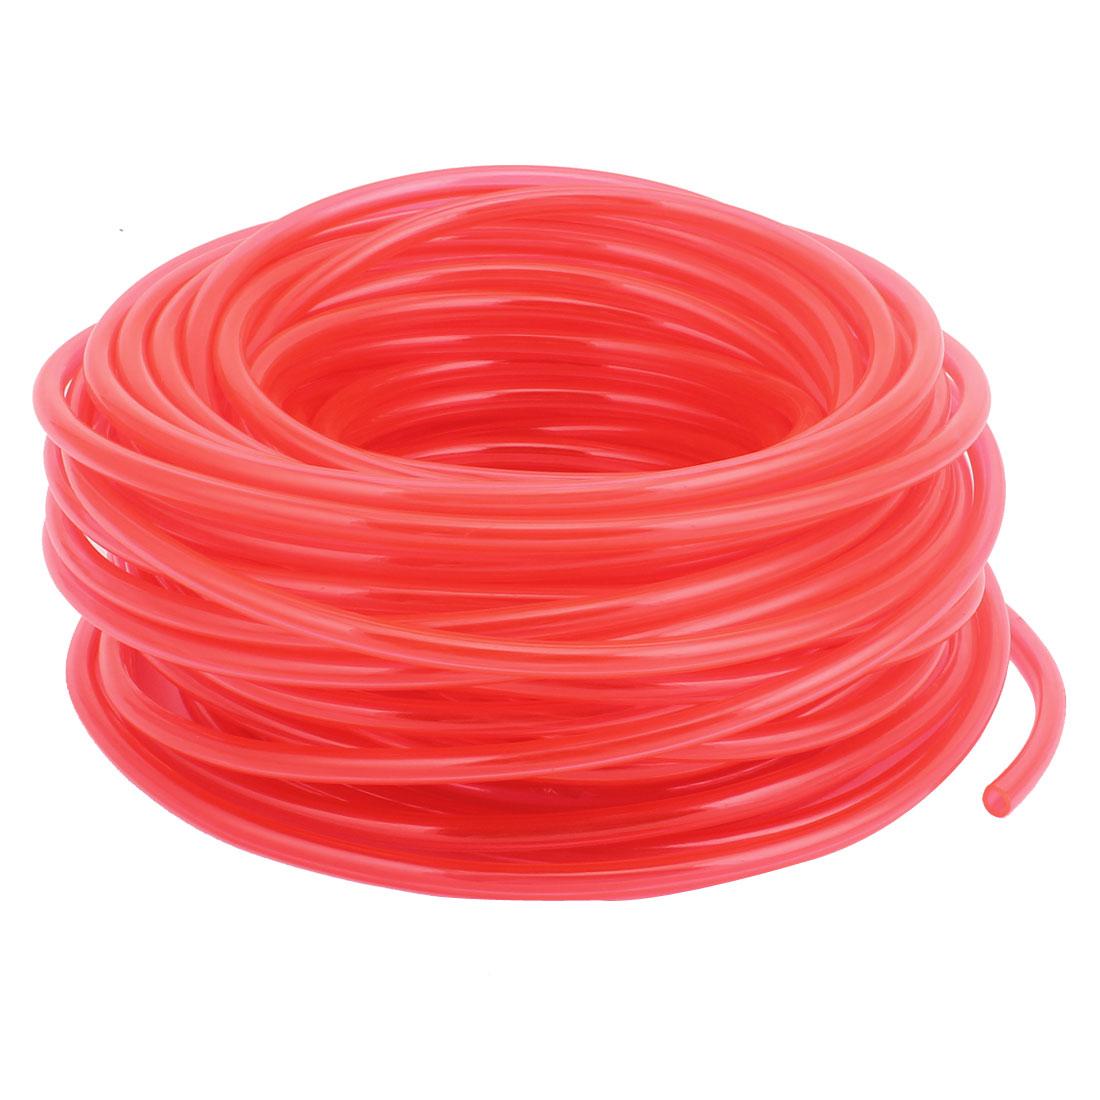 6mmx4mm Dia 22M Length Fuel Gas Air Polyurethane PU Tubing Hose Pipe Red